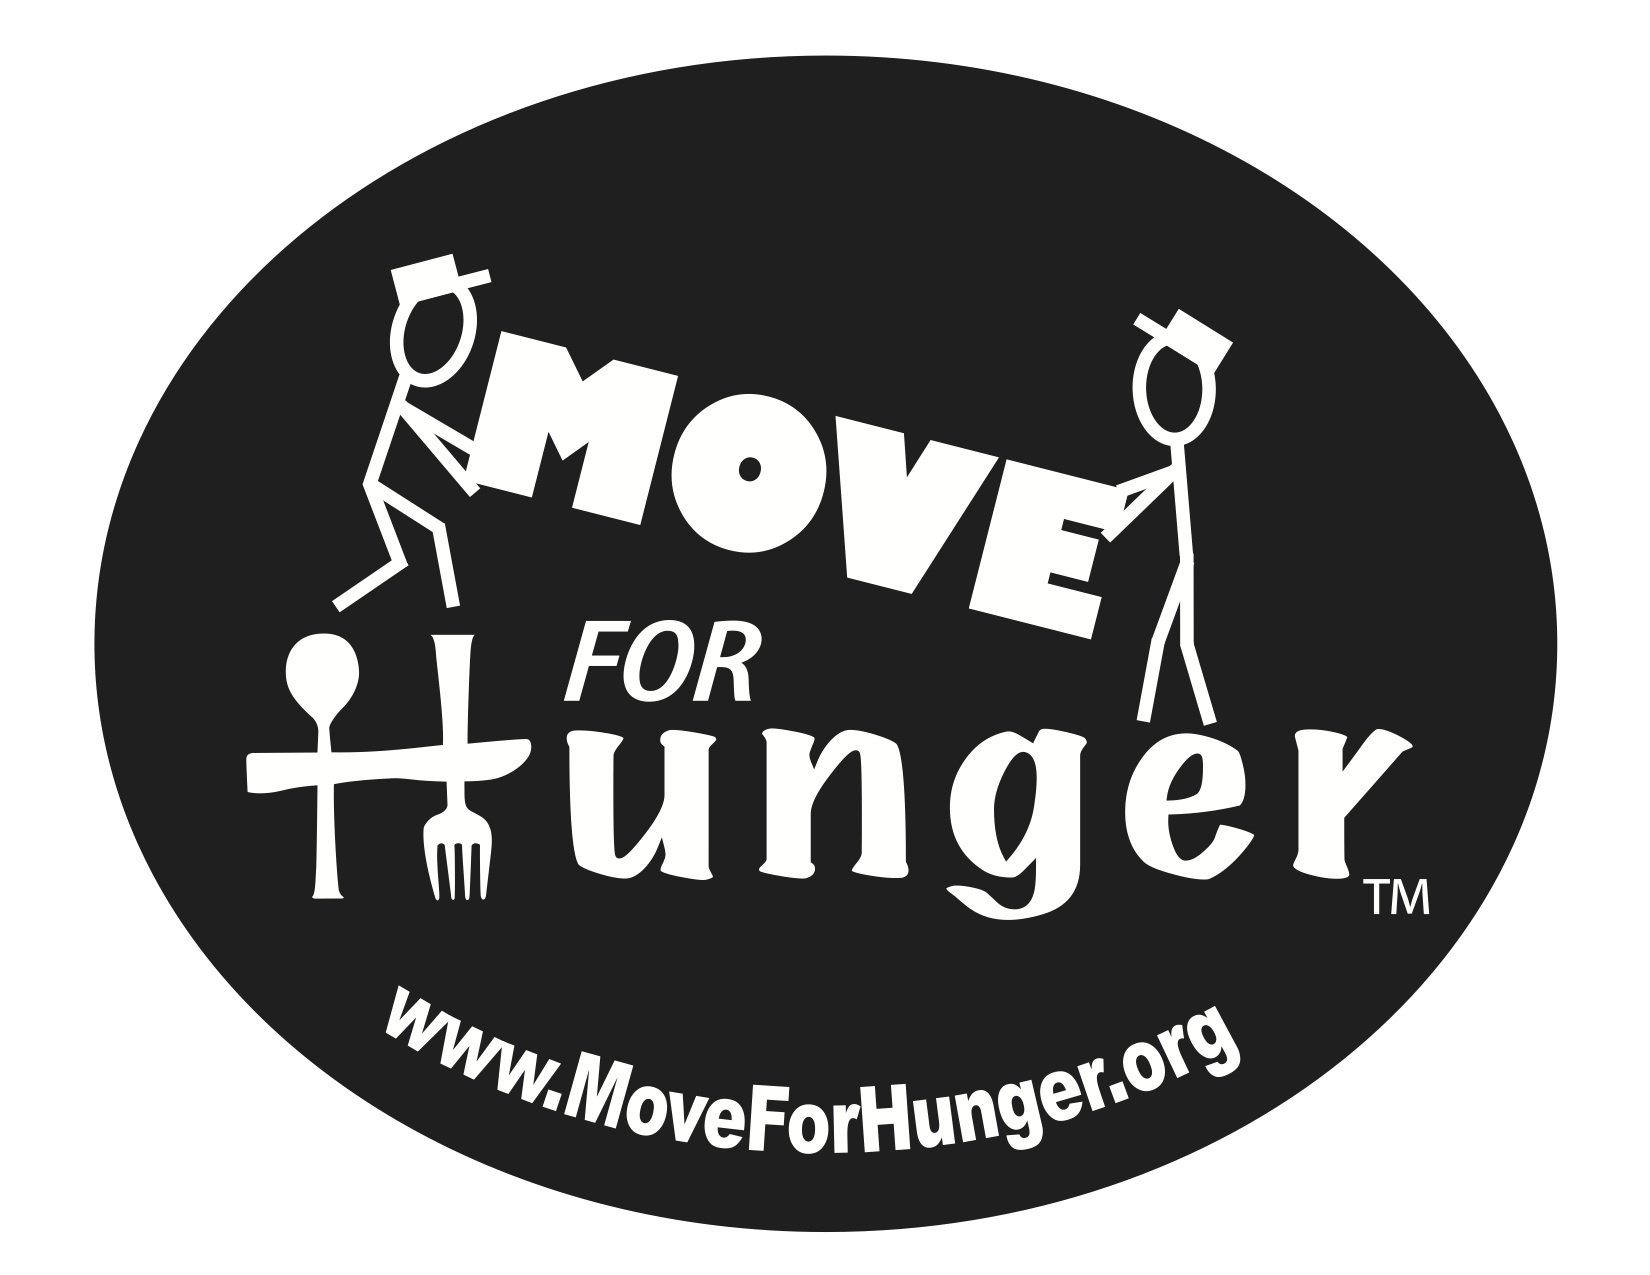 baa4b4d68064c11a95f1_Move_For_Hunger_Master_Logo-Vector_Oval_copy_2.jpg